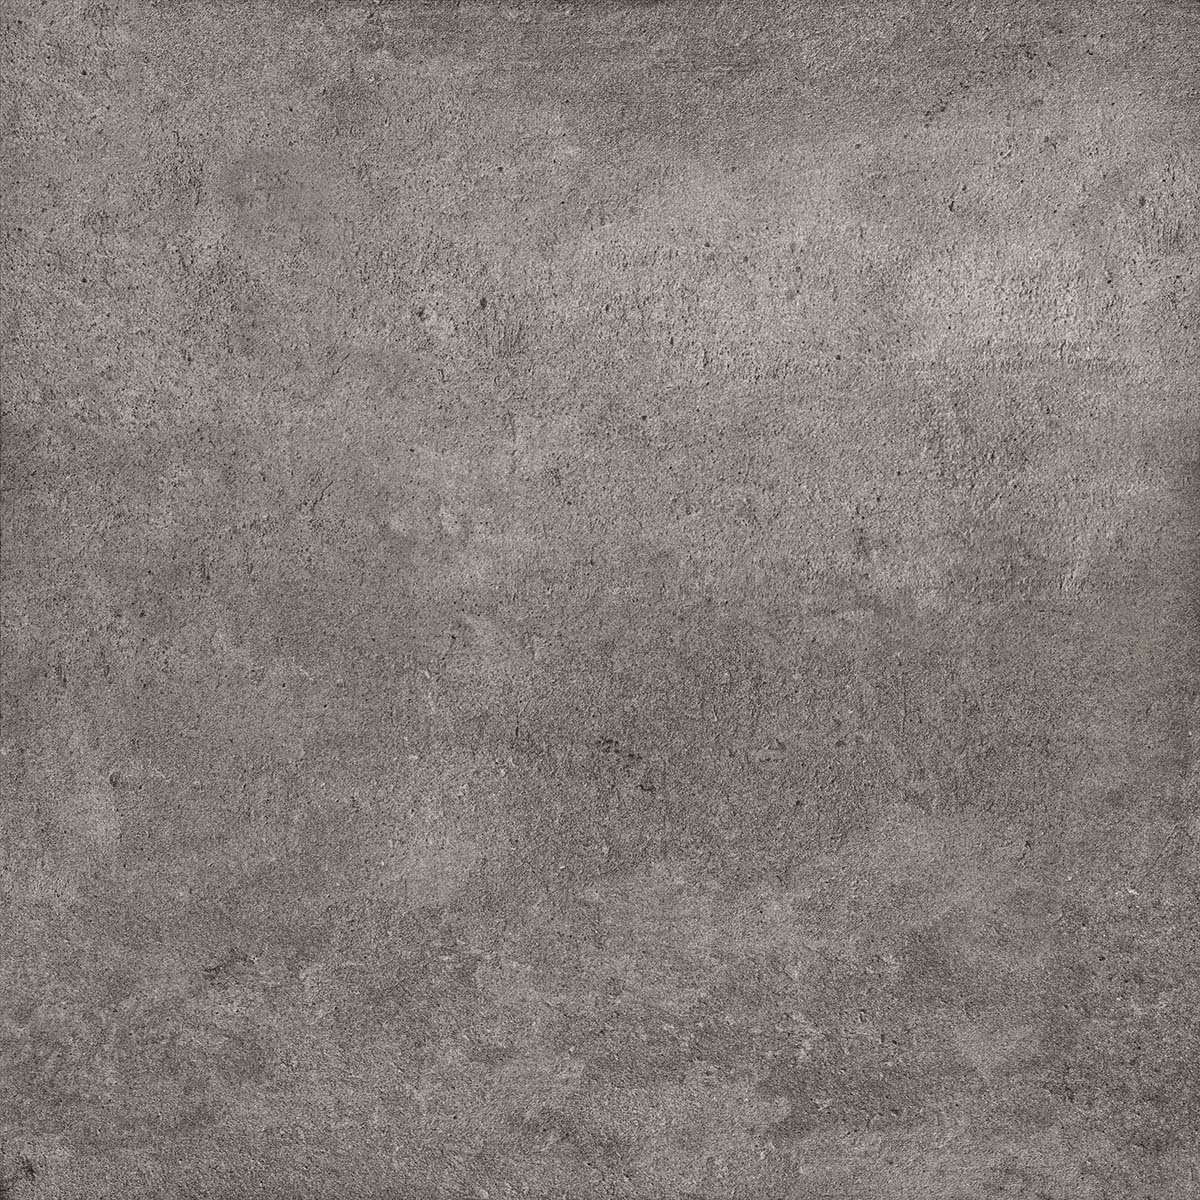 SLIMBOY black Image